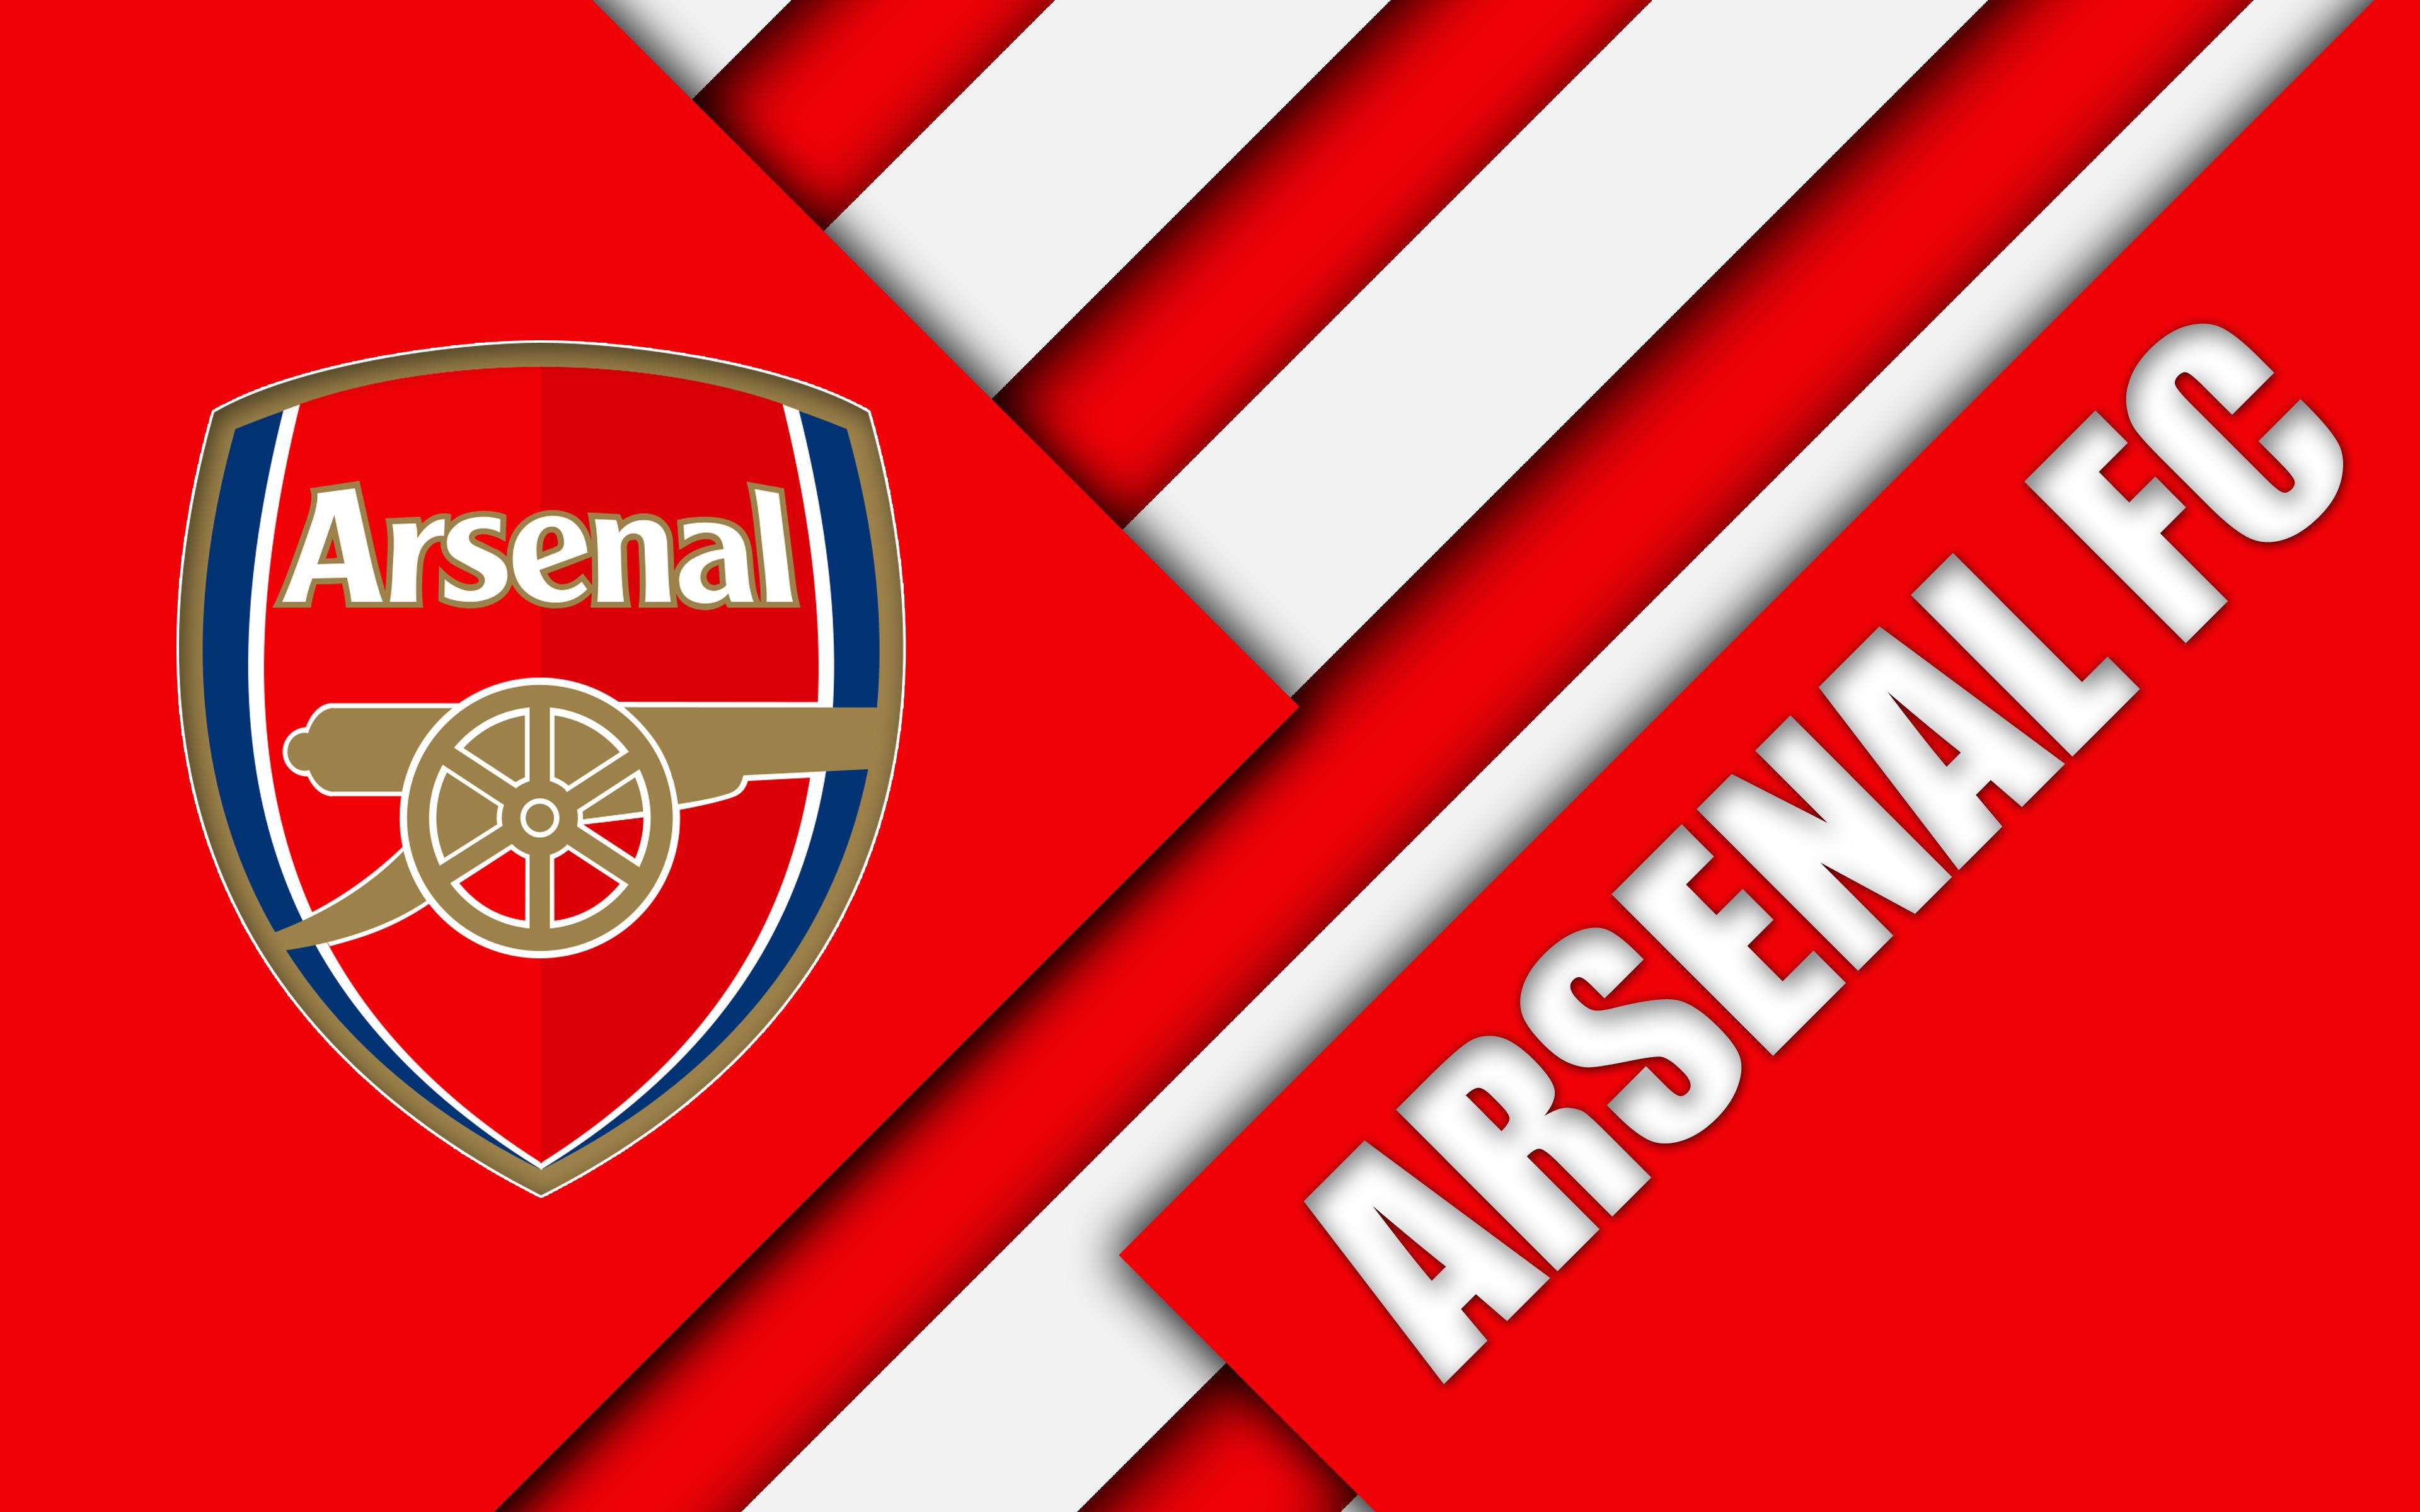 Arsenal Logo 4k Ultra Hd Wallpaper Background Image 3840x2400 Id 970079 Wallpaper Abyss